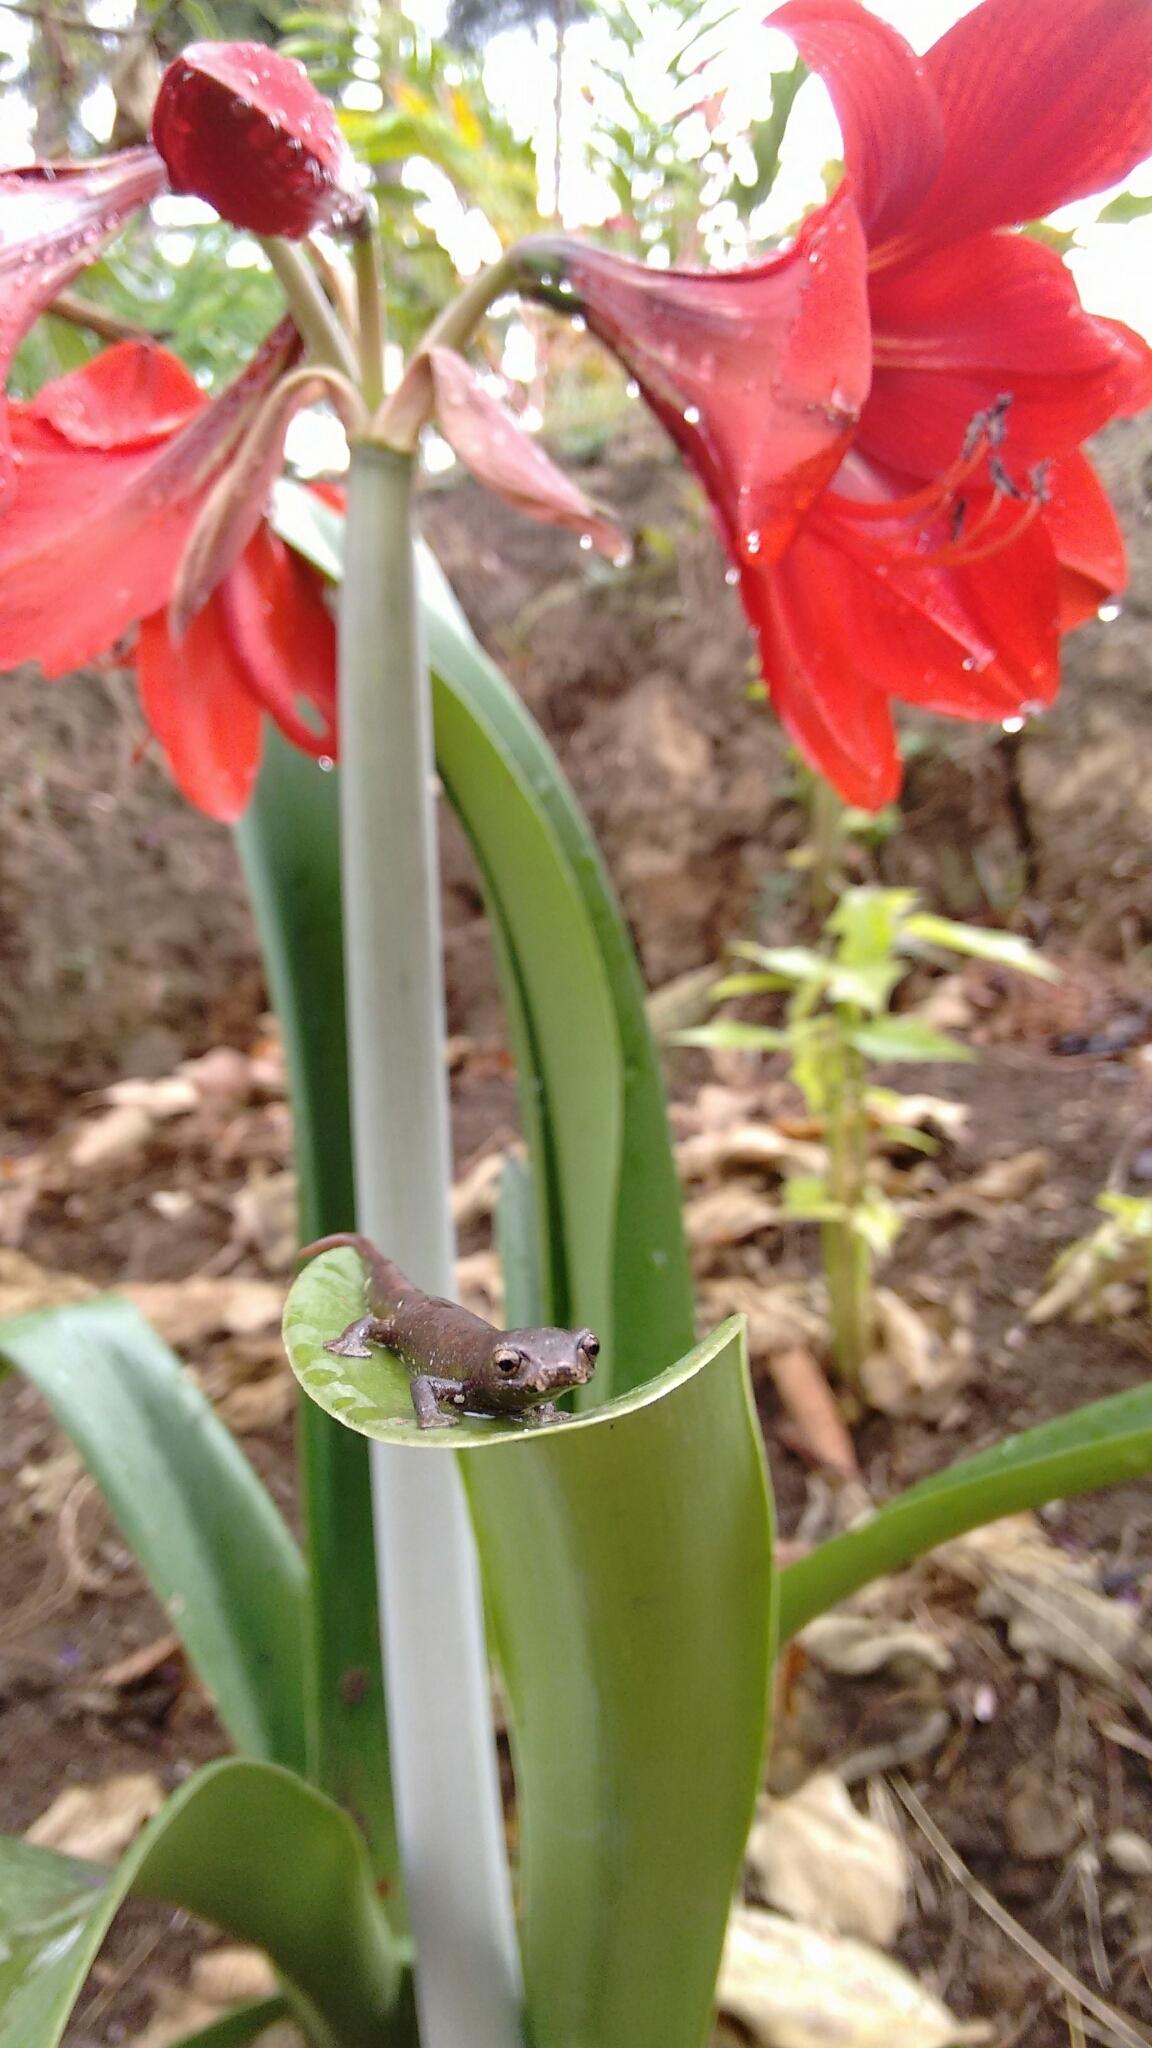 Image of Ramos' Mushroomtongue Salamander